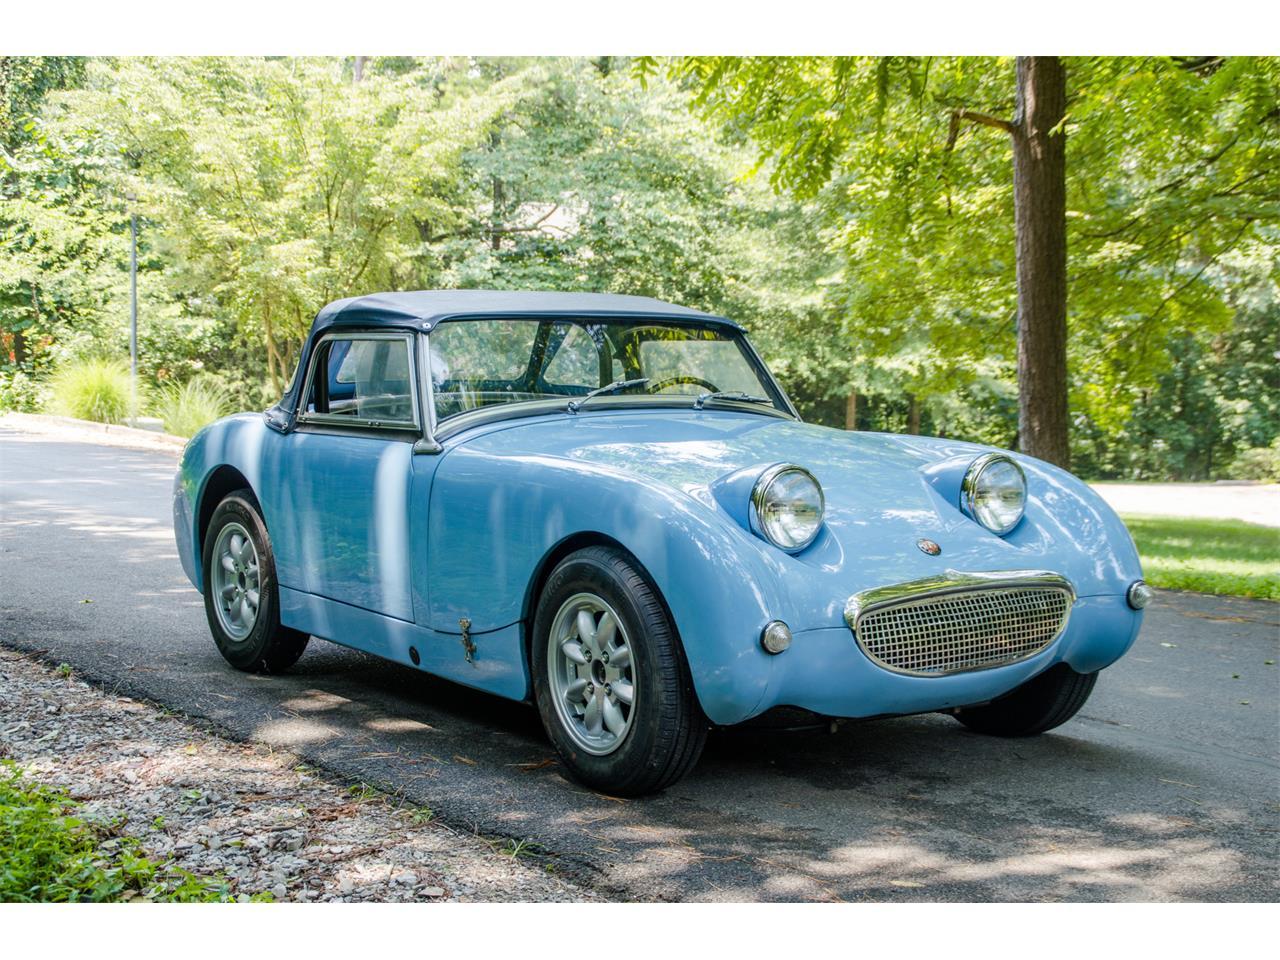 "1959 austin healey bugeye sprite for sale classiccars com simple house wiring diagram bob capo& 39;s 1959 bugeye sprite restoration"""